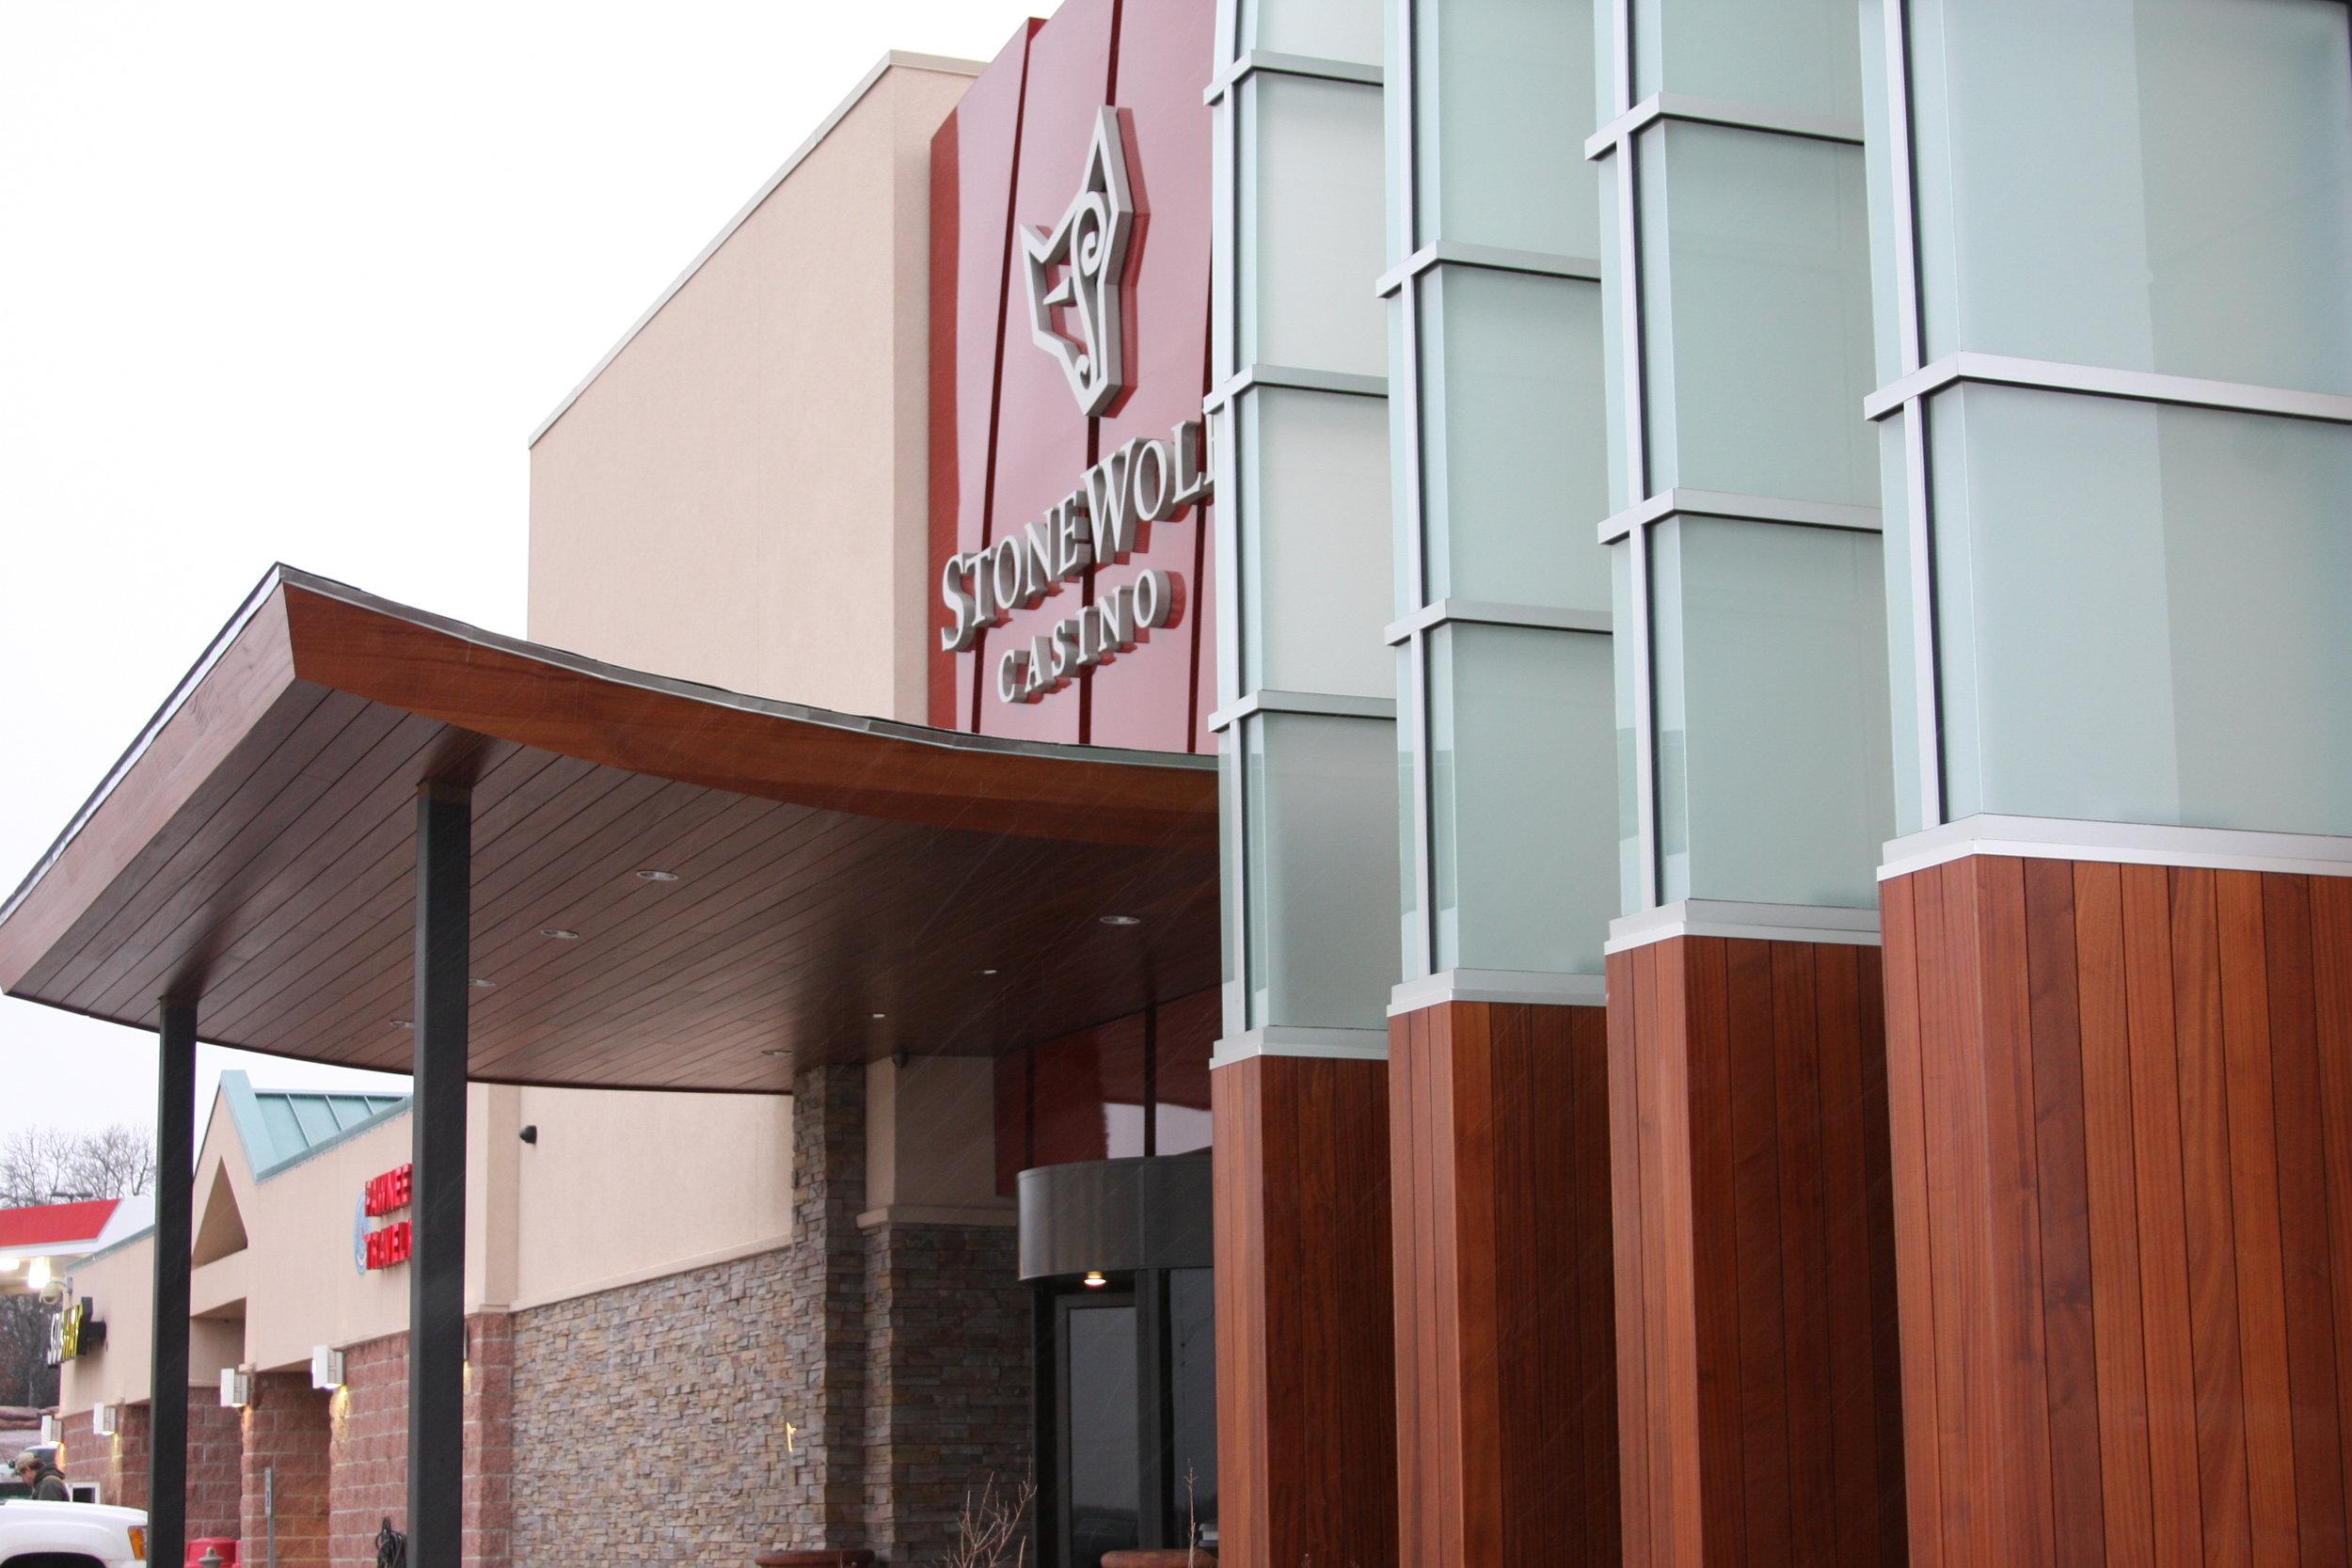 StoneWolf Casino - Pawnee, OK